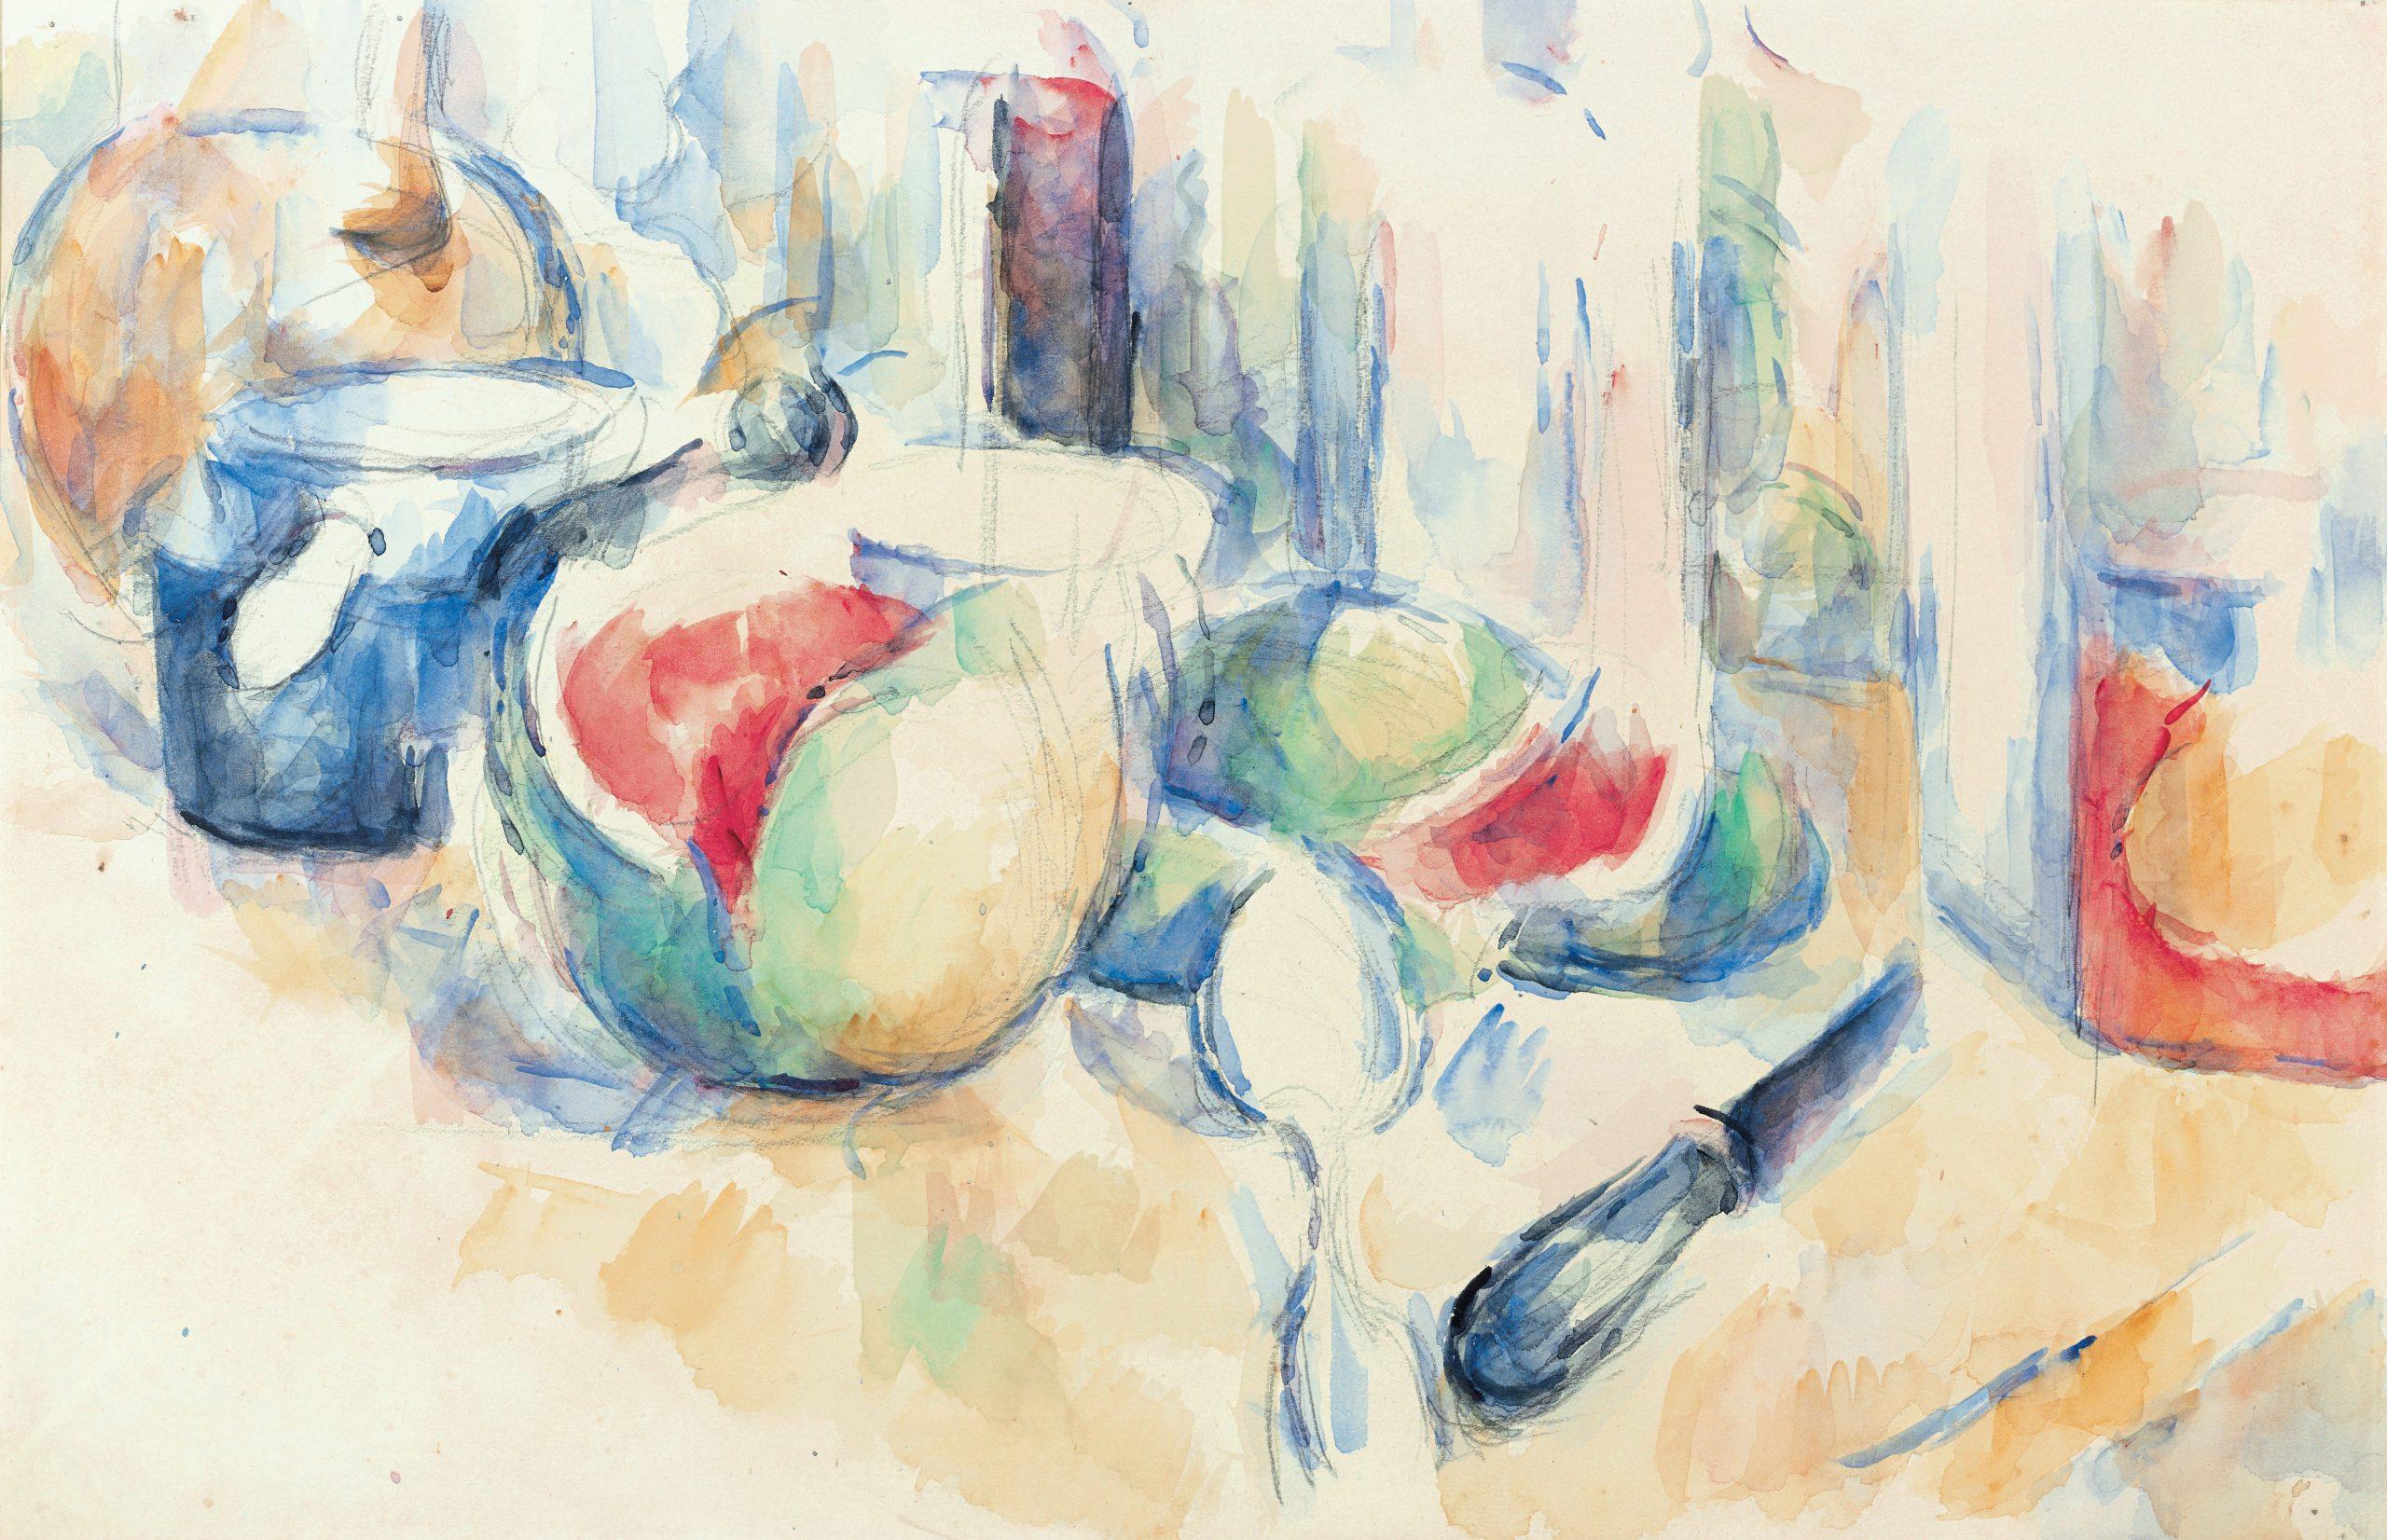 Paul Cézanne: Zátišie s nakrojenými melónmi © Zbierka Triton Foundation, Holands